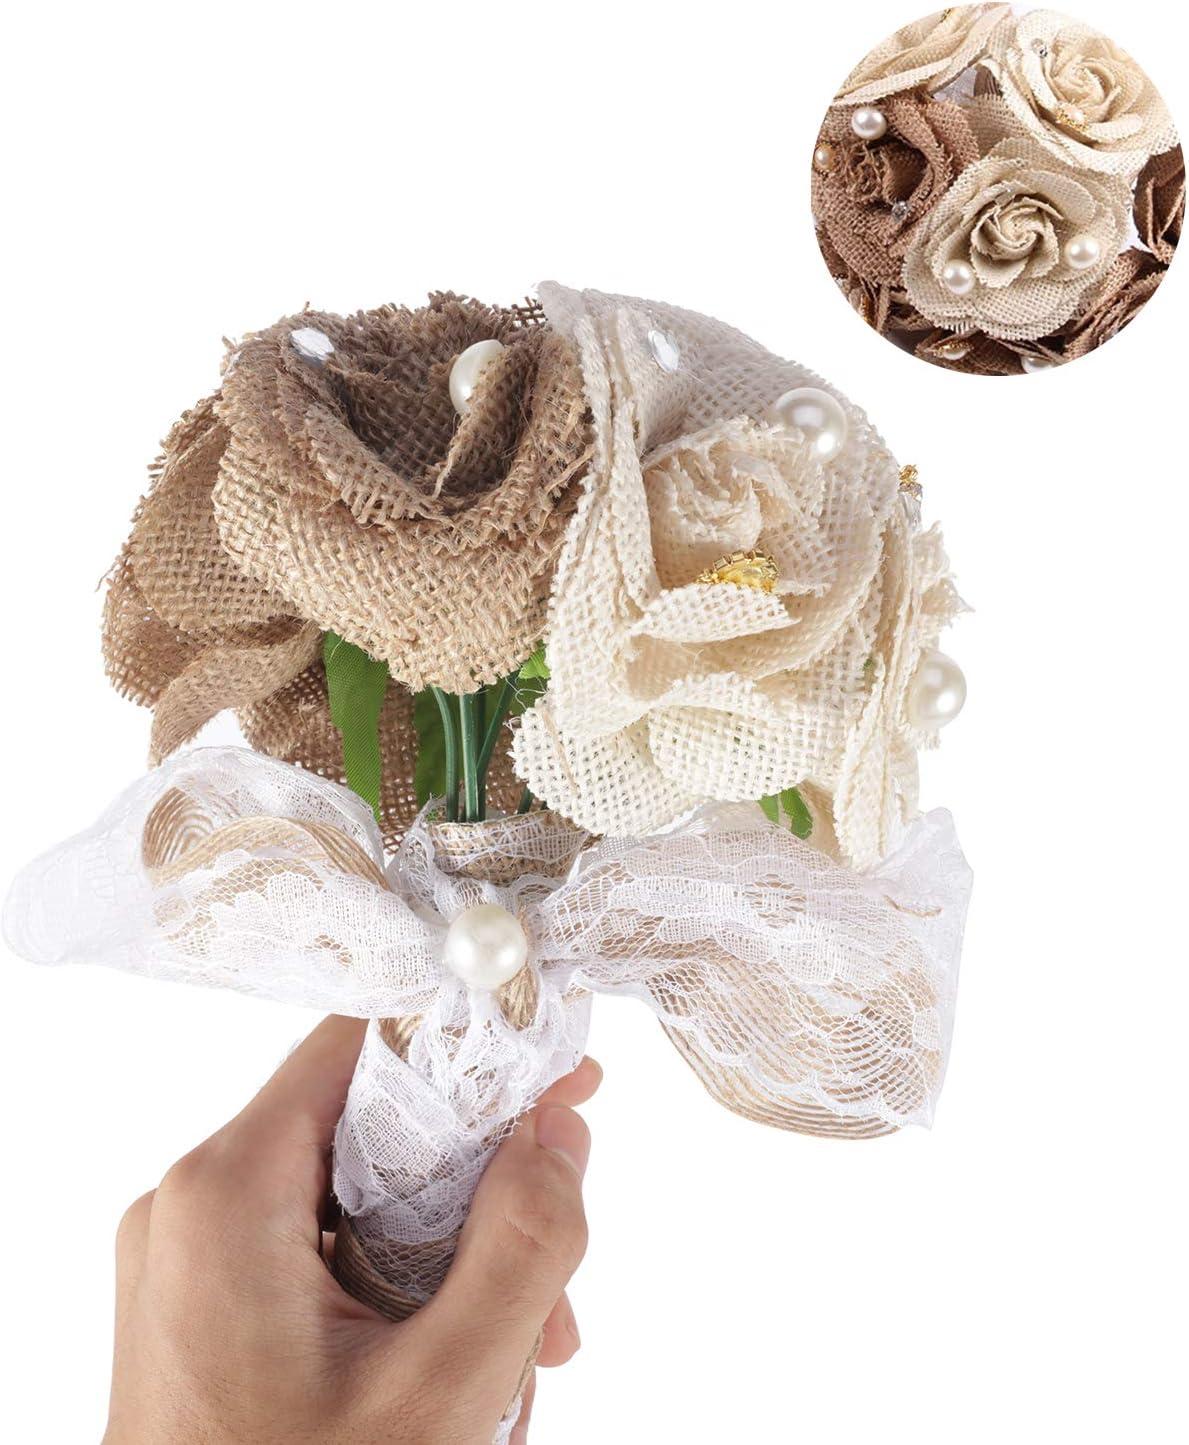 Bouquet Sposa Juta.Gofypel Wedding Bouquet Di Fiori Bouquet Sposa Iuta Con Pizzo E